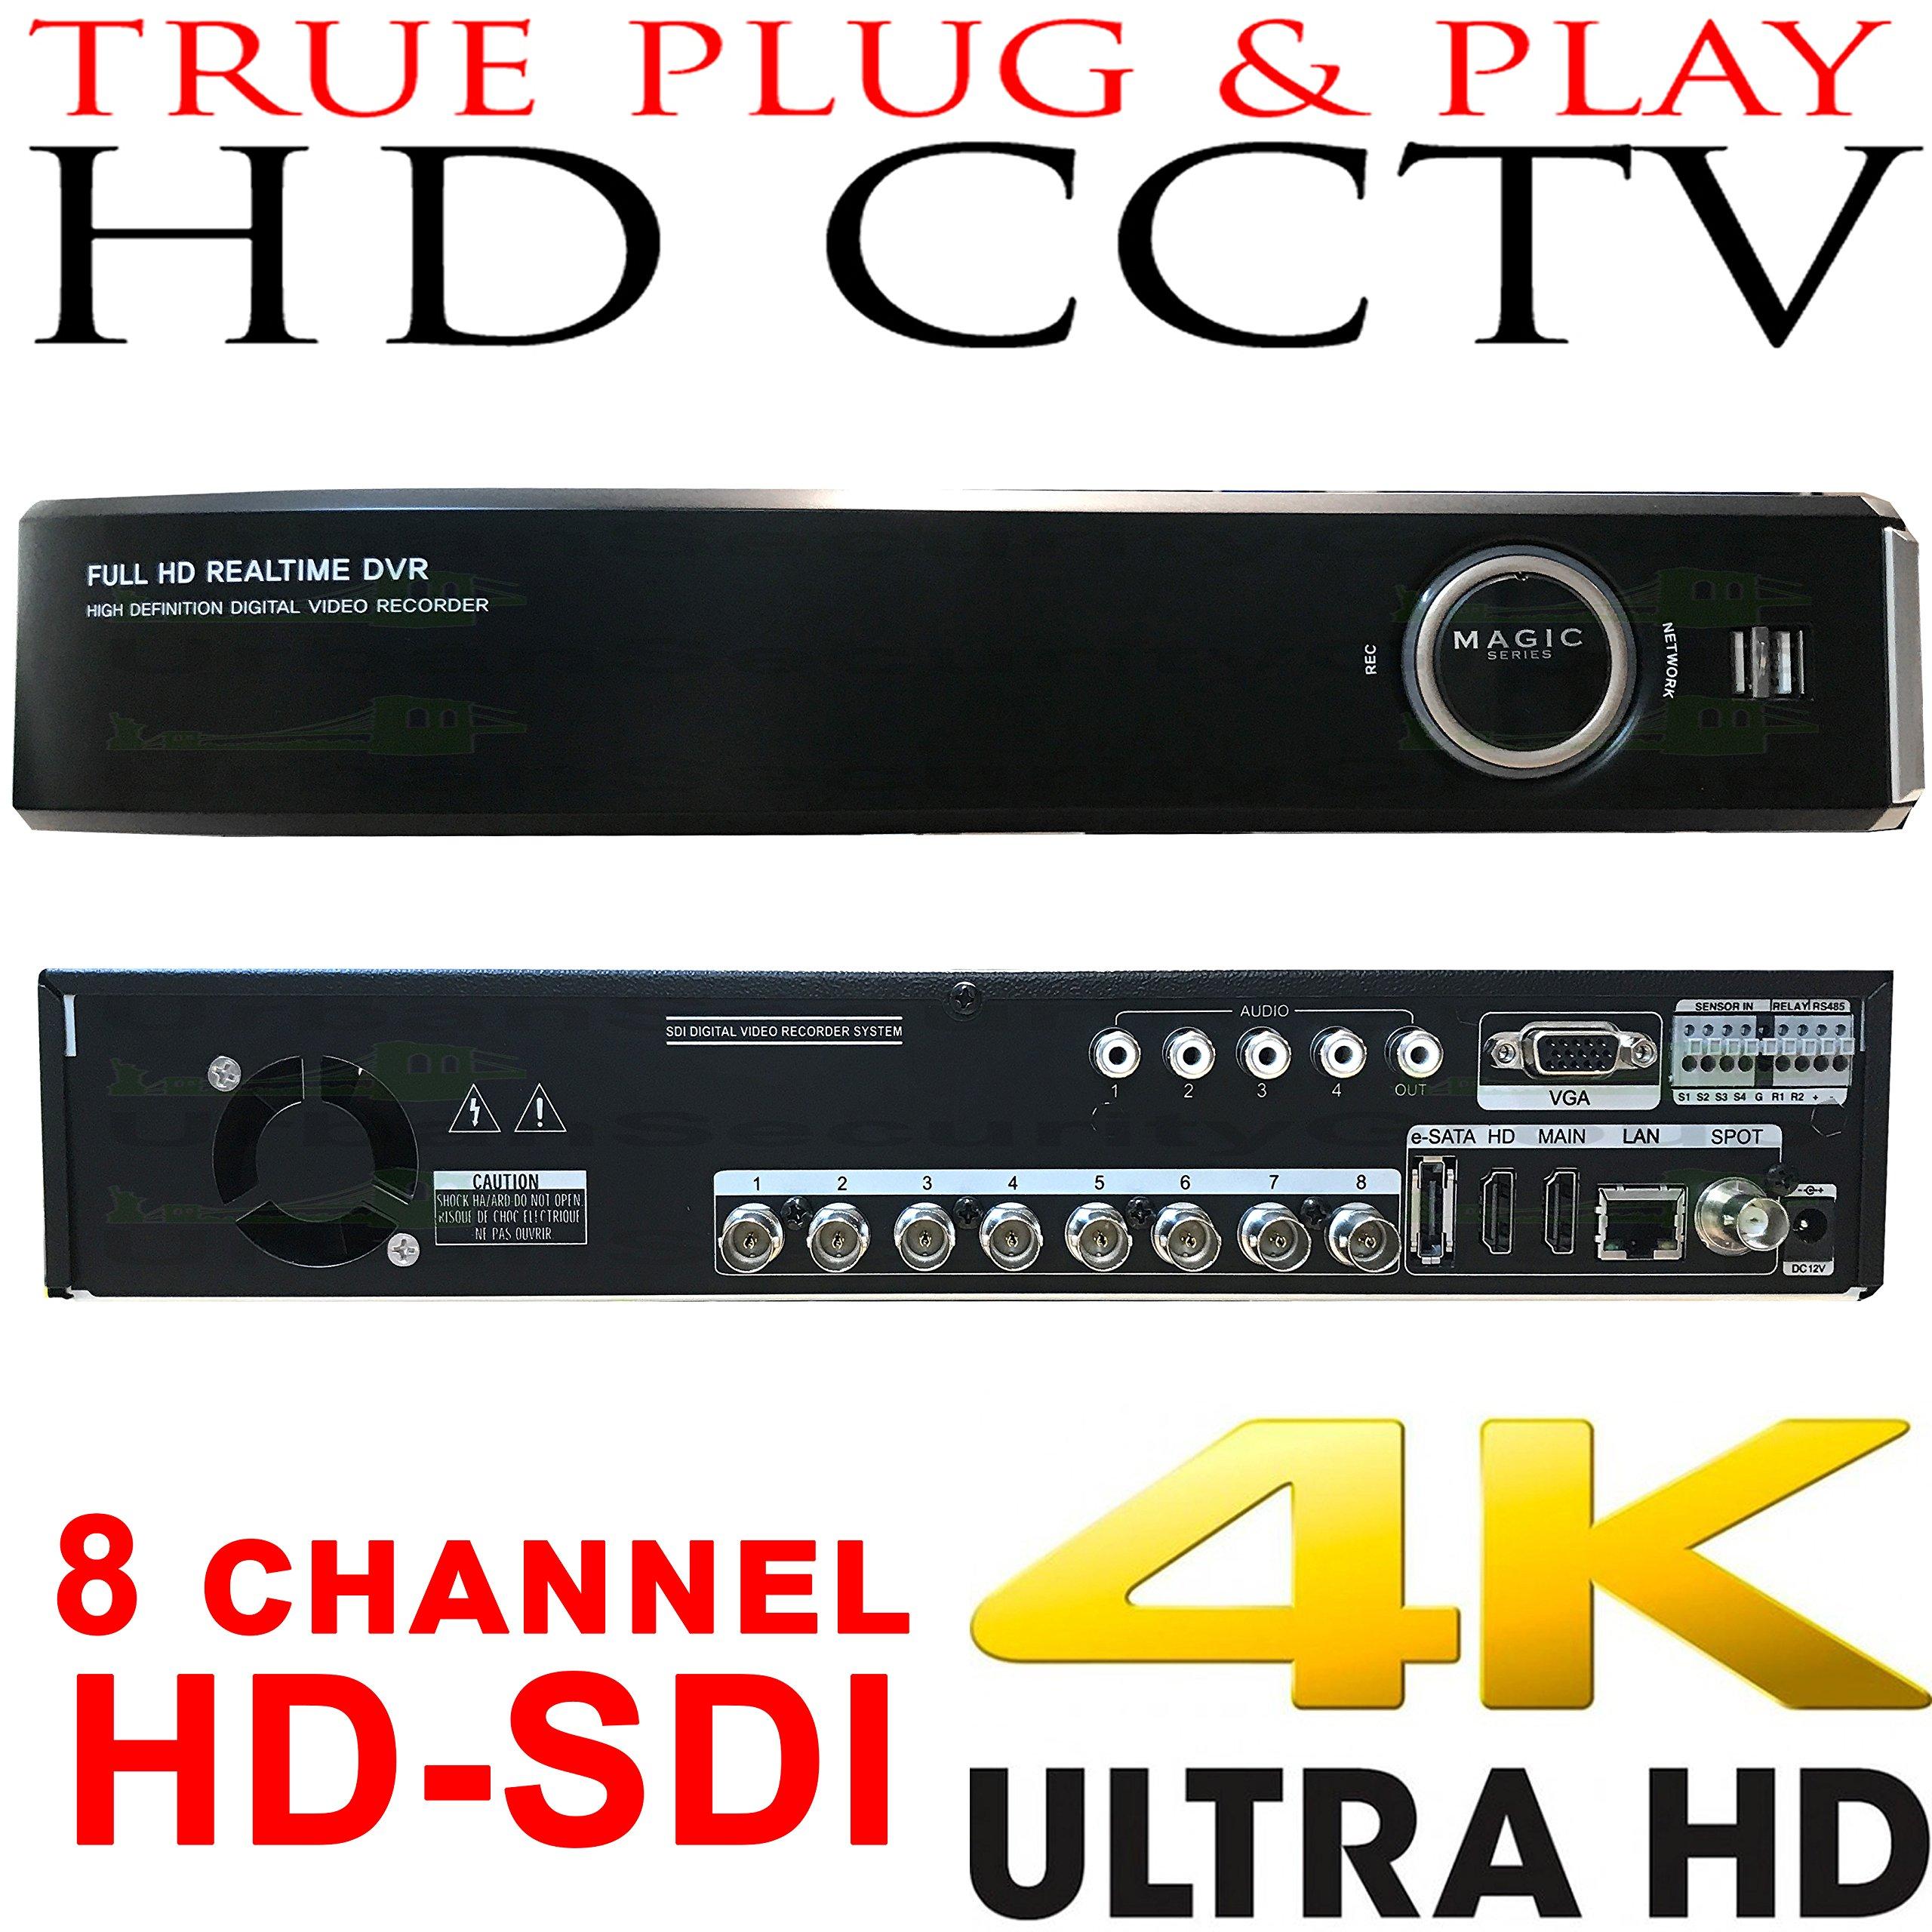 USG Business Grade 4MP 8 Channel HD-SDI Security DVR + 4TB HDD : Up To 4MP Video Resolution, 8x BNC HD Video-In, 2x SATA, USB, 2x HDMI + VGA + Spot BNC, RCA Audio, RS232C, Alarm : Free Phone App